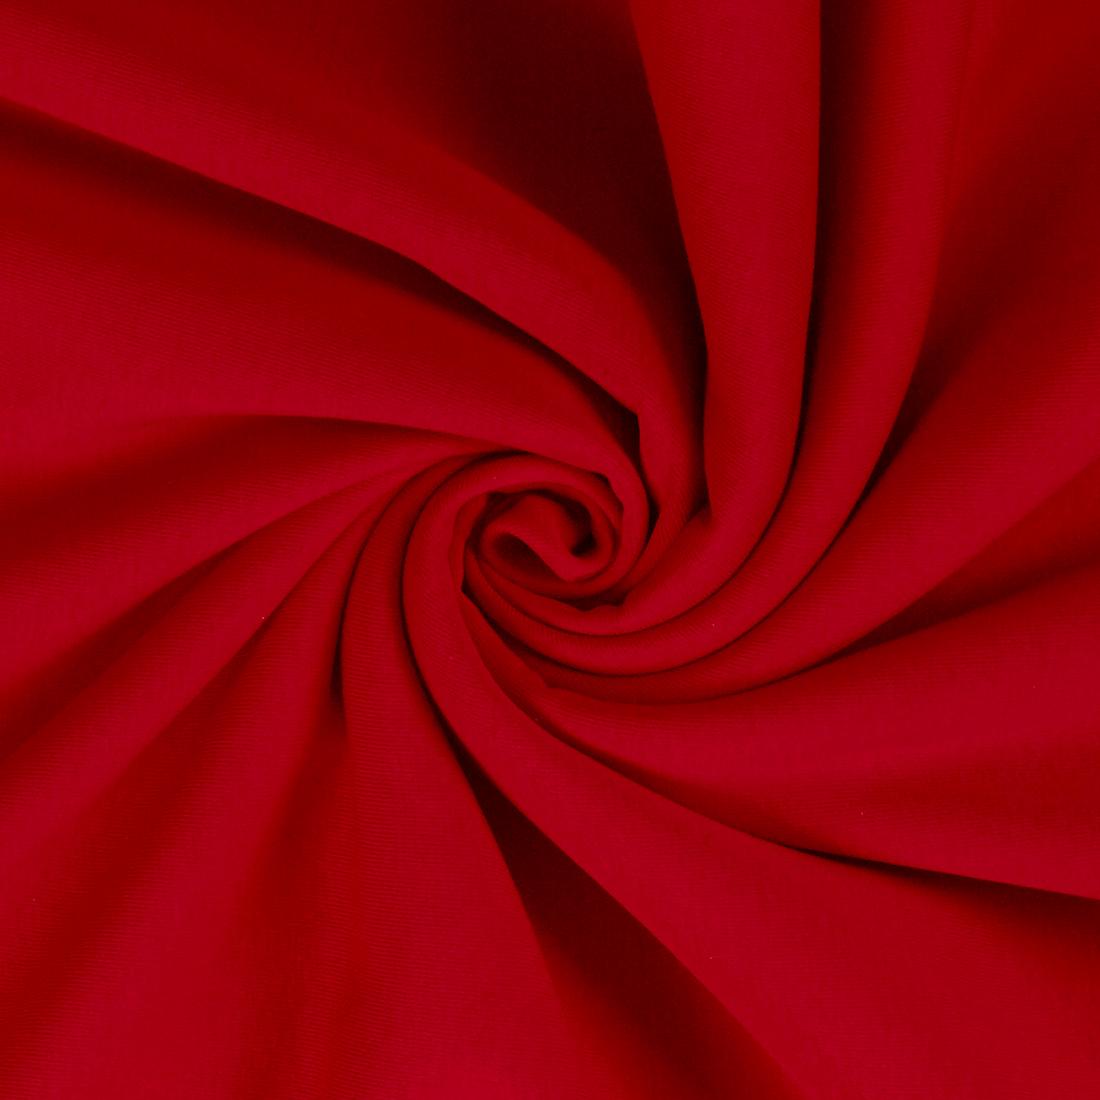 Sweatshirt Jersey Red Dress Fabric